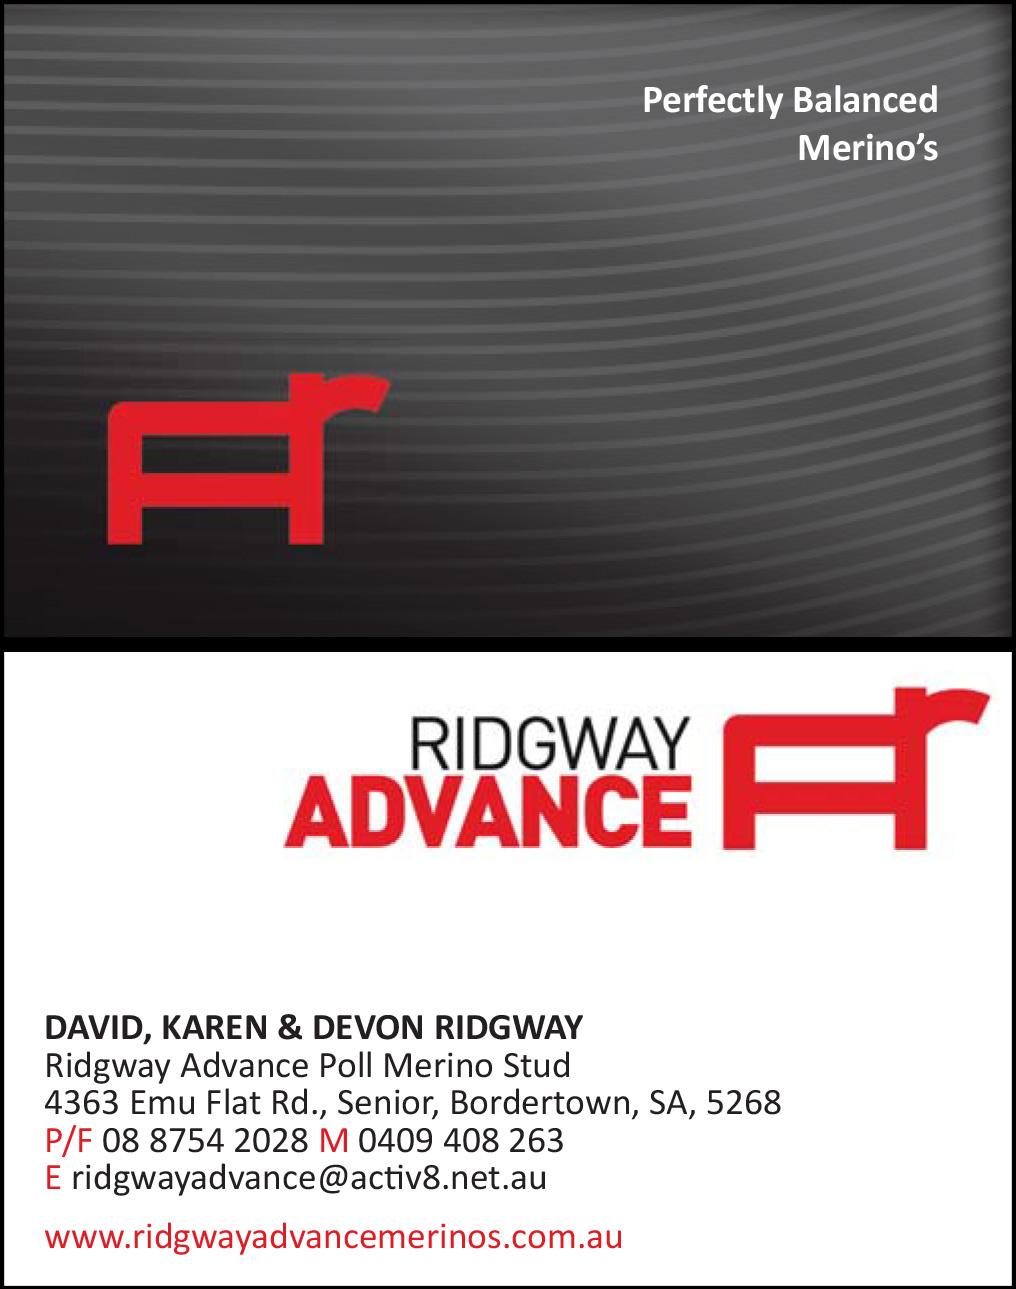 Ridgway Advance